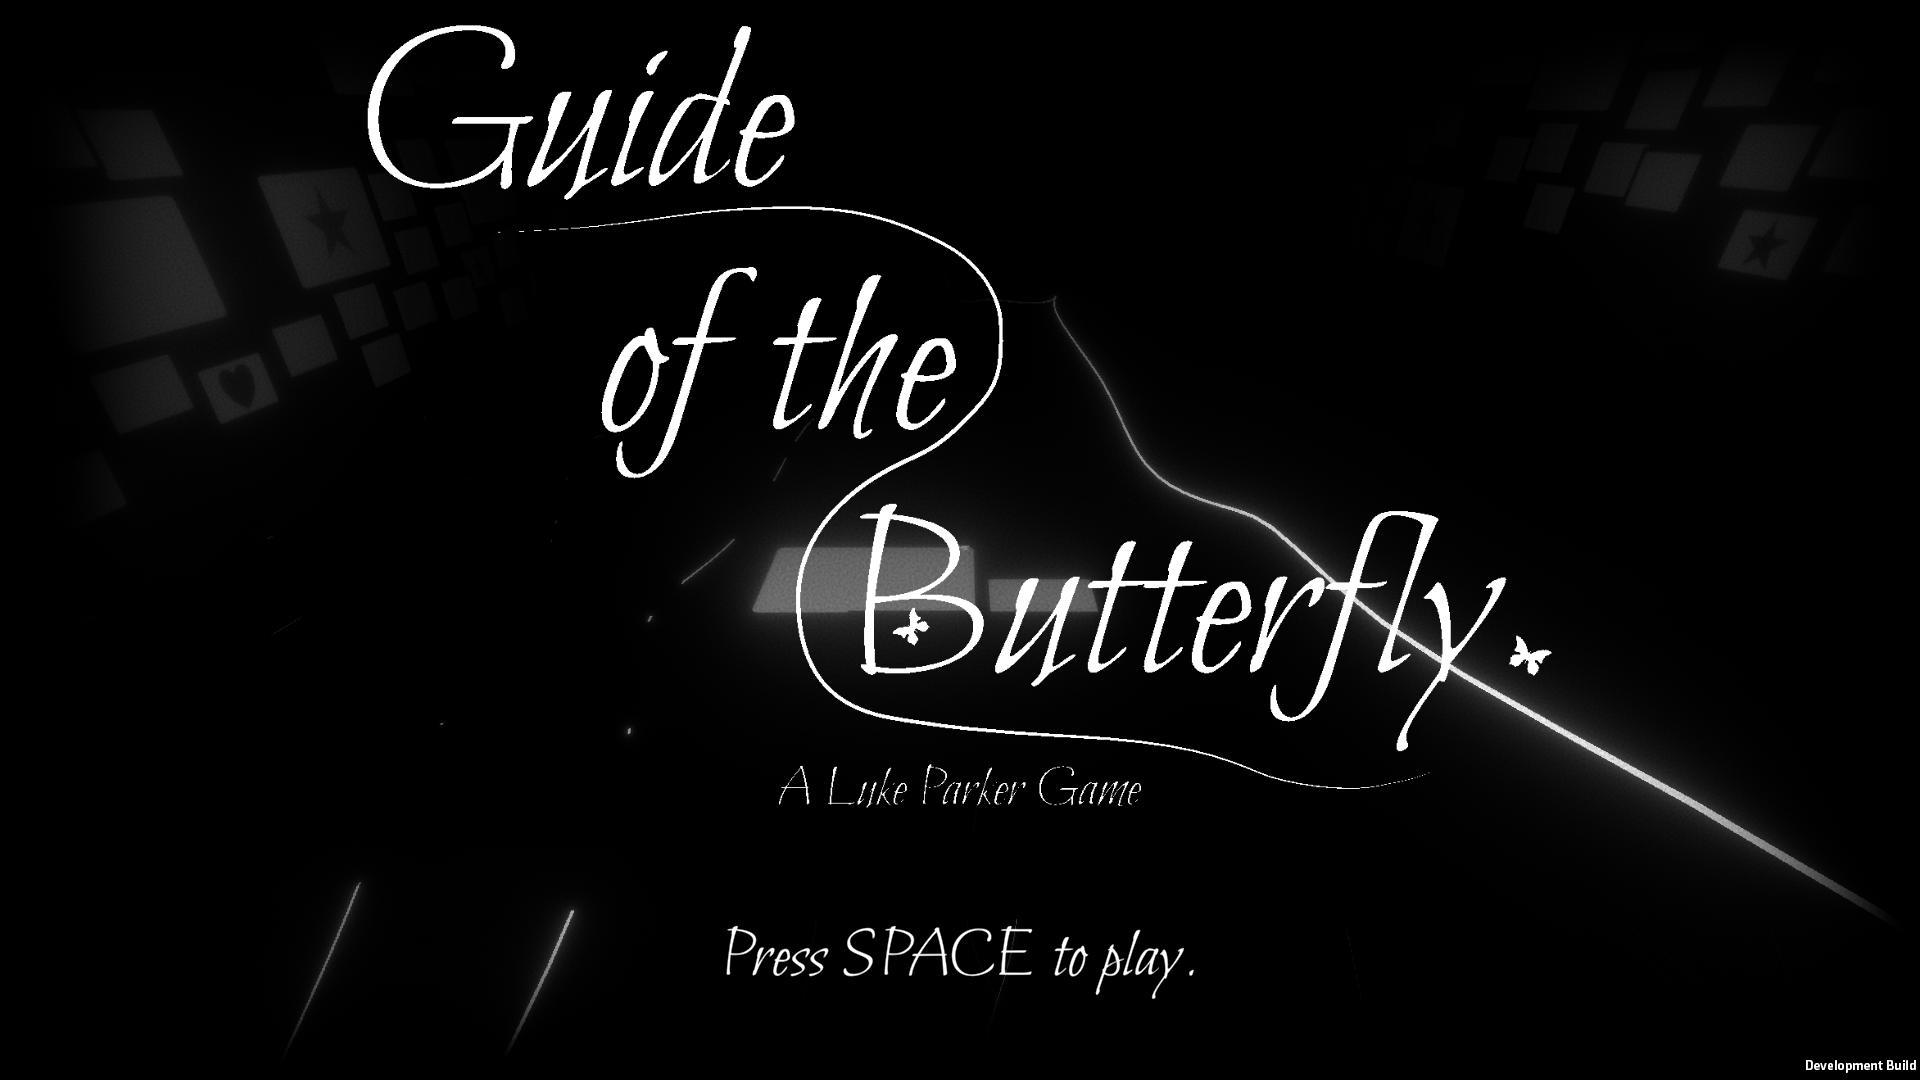 Guide_of_the_Butterfly_VVSBX0vJm8